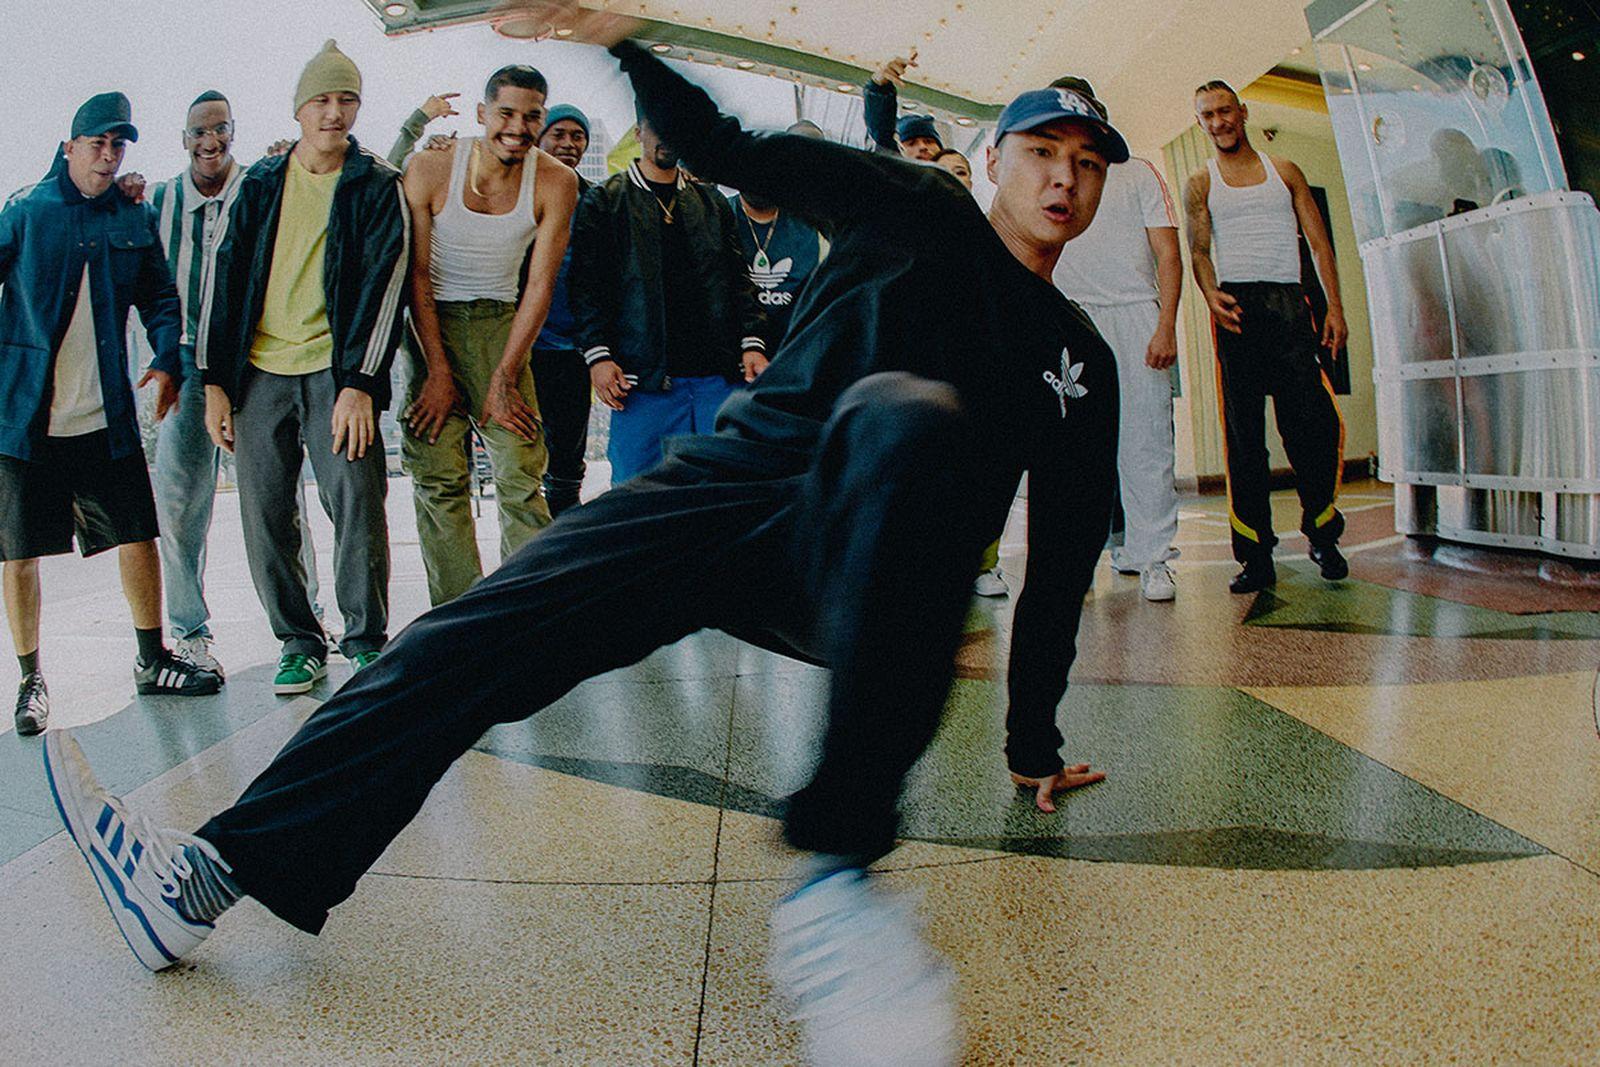 Center: Toonz Background from left to right: Joel, Ryan, Jet, Swap, Fresh, Yuri